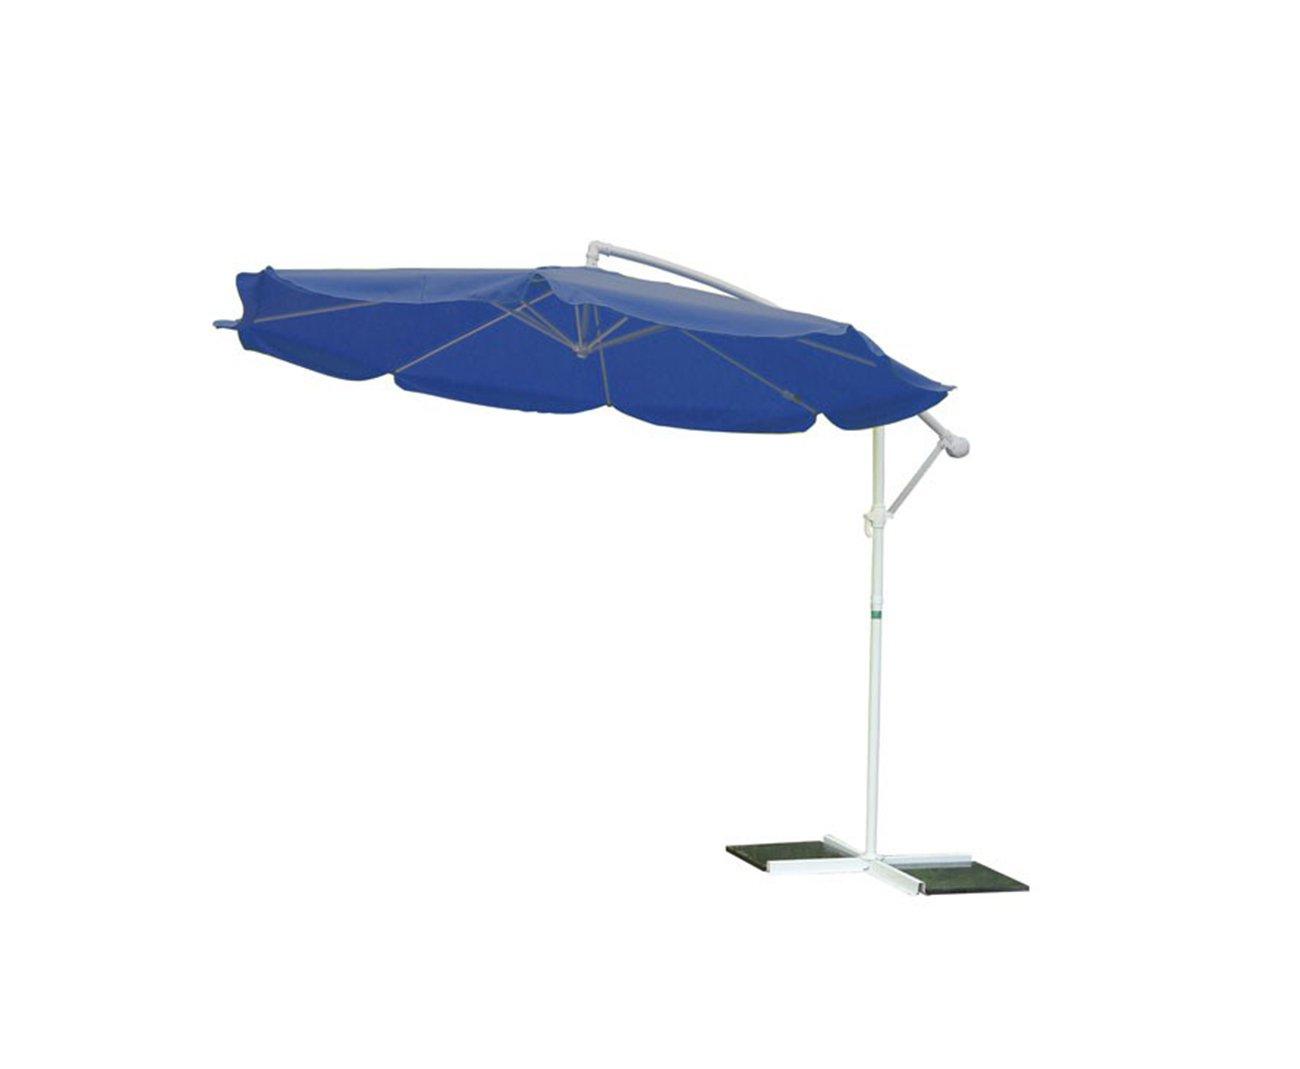 Ombrelone Malibu 300 Azul - Nautika